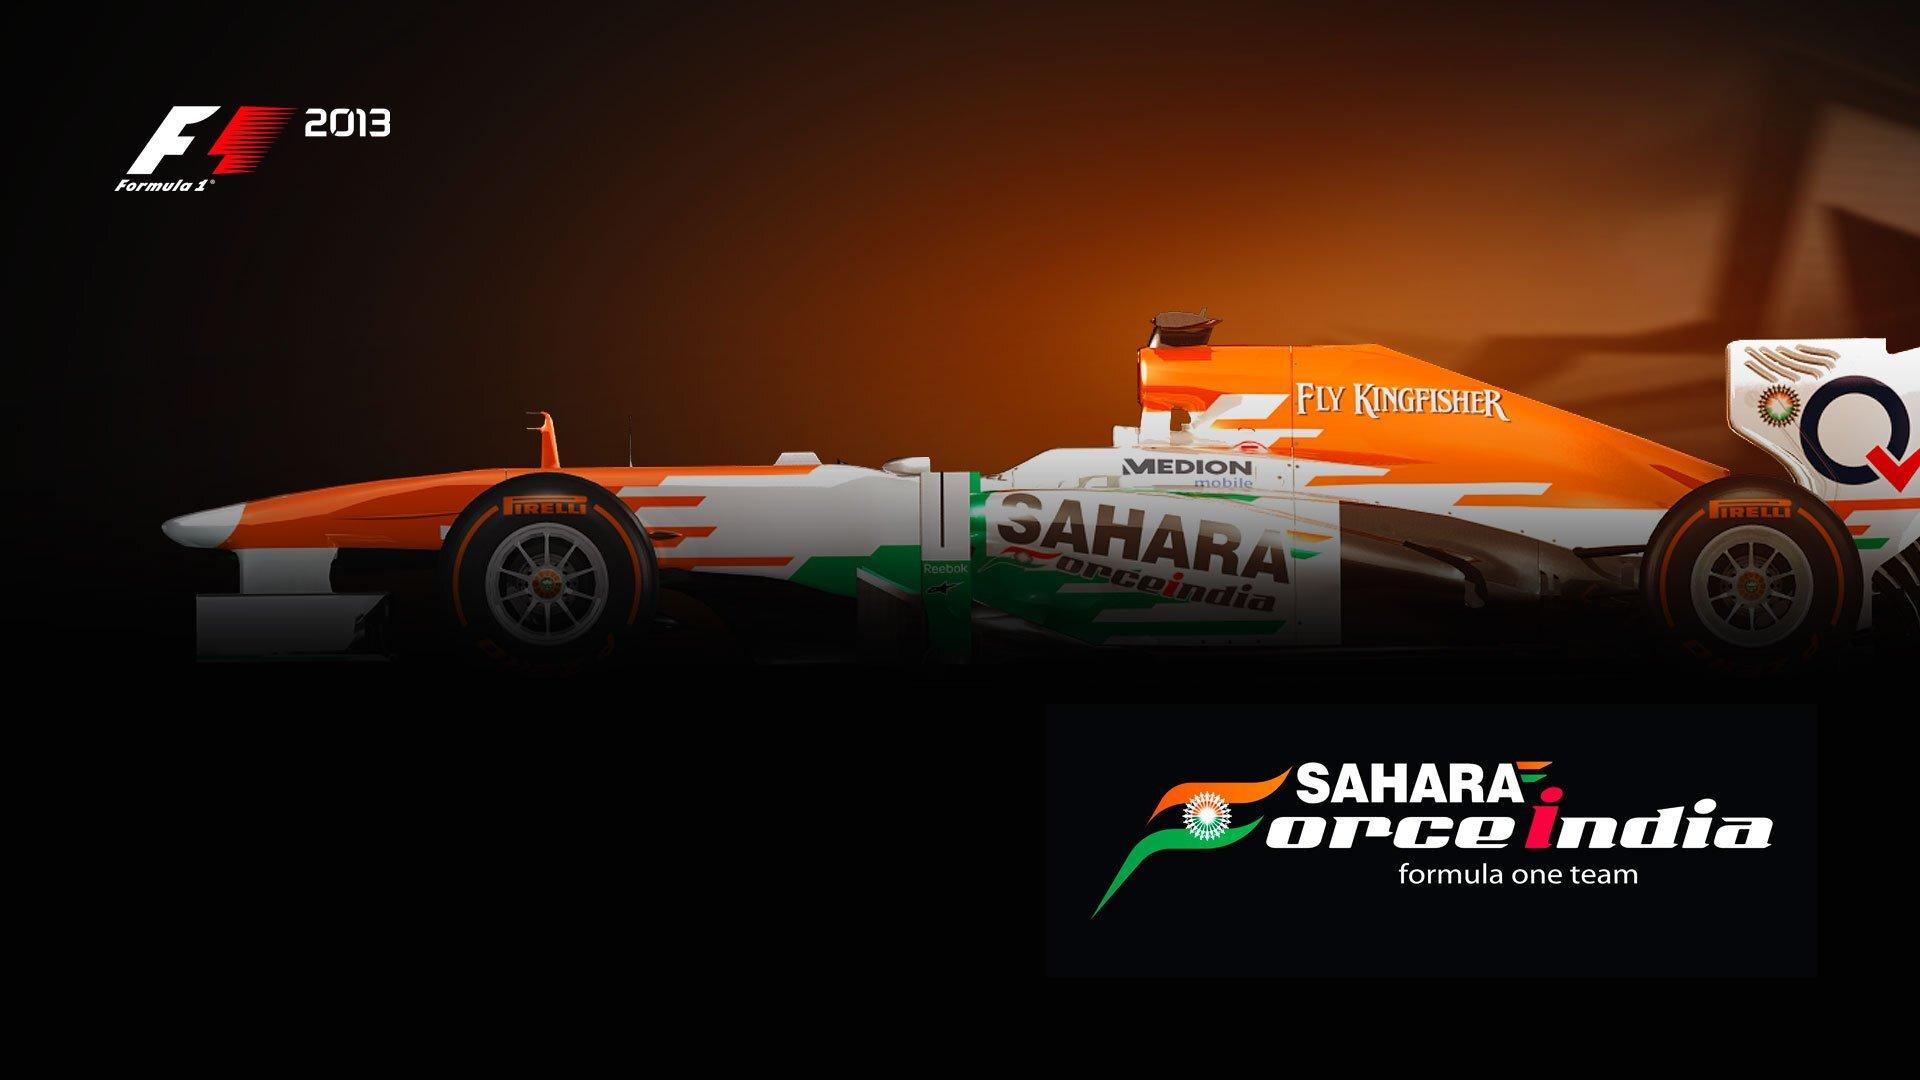 1920x1080 India F1 Team Laptop Full Hd 1080p Hd 4k Wallpapers